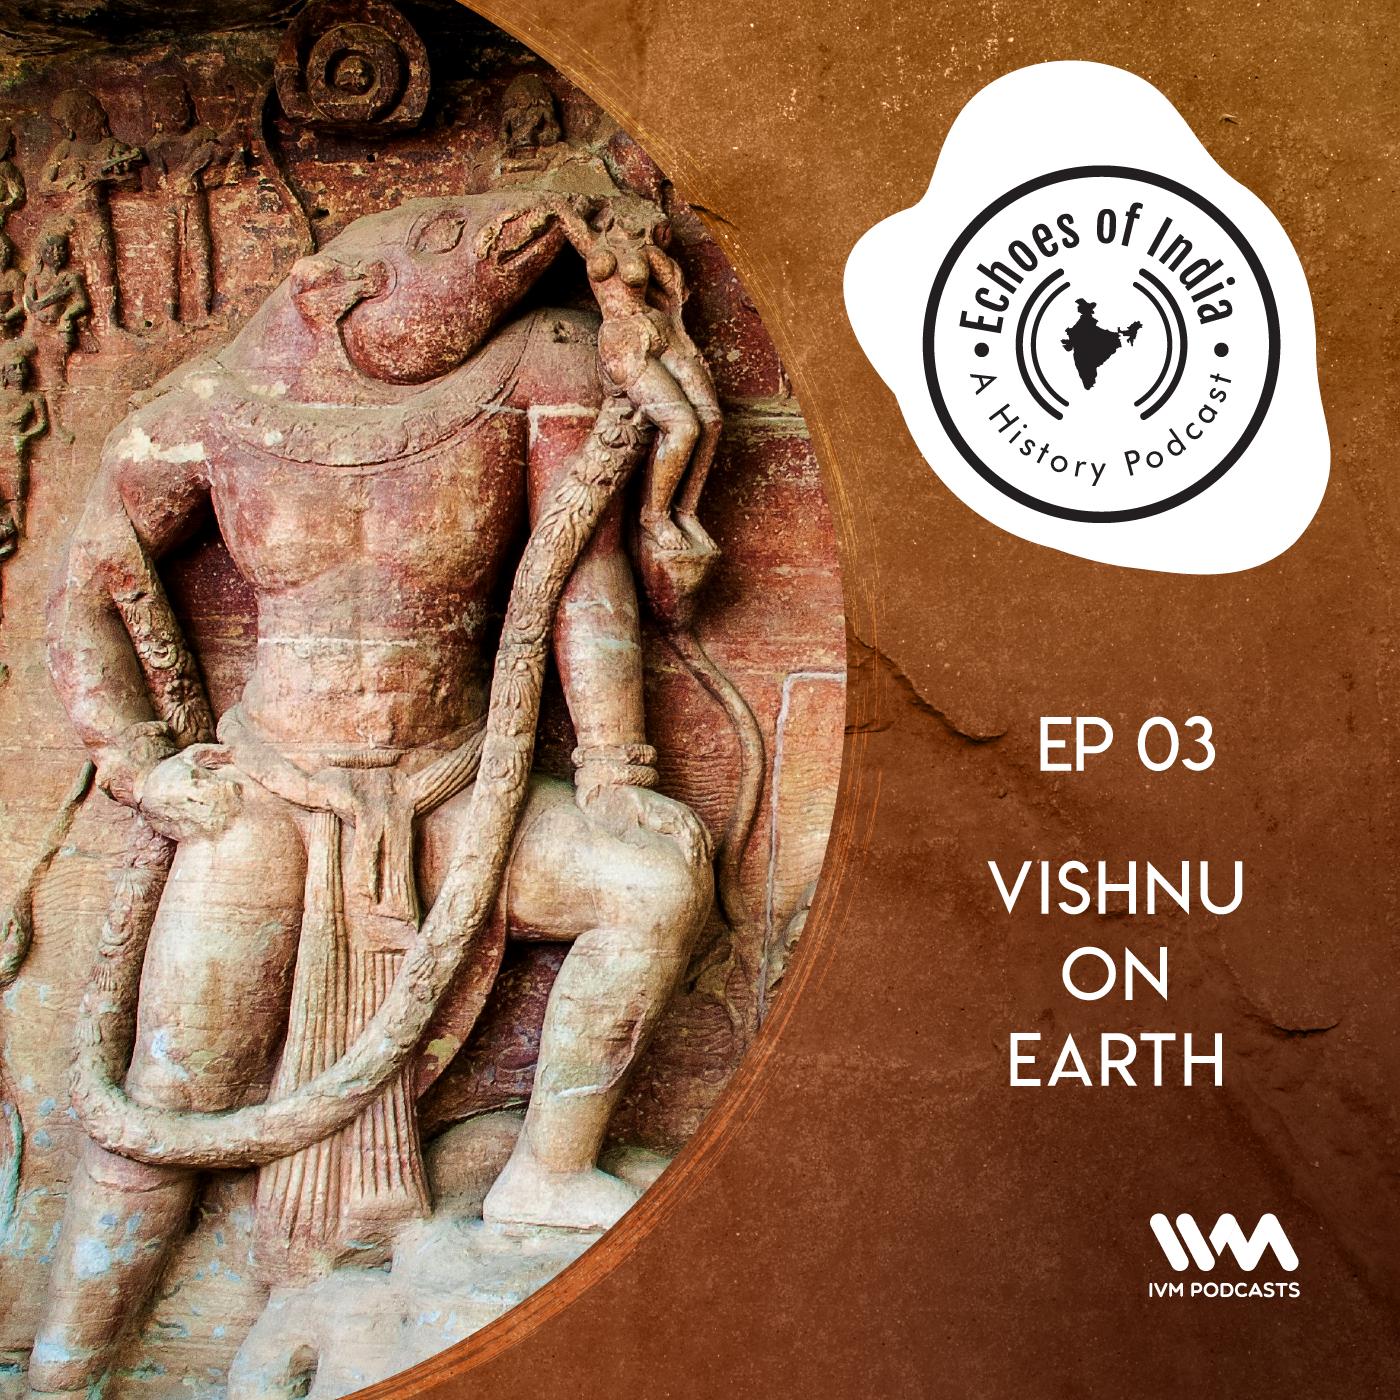 S02 E03: Vishnu on Earth